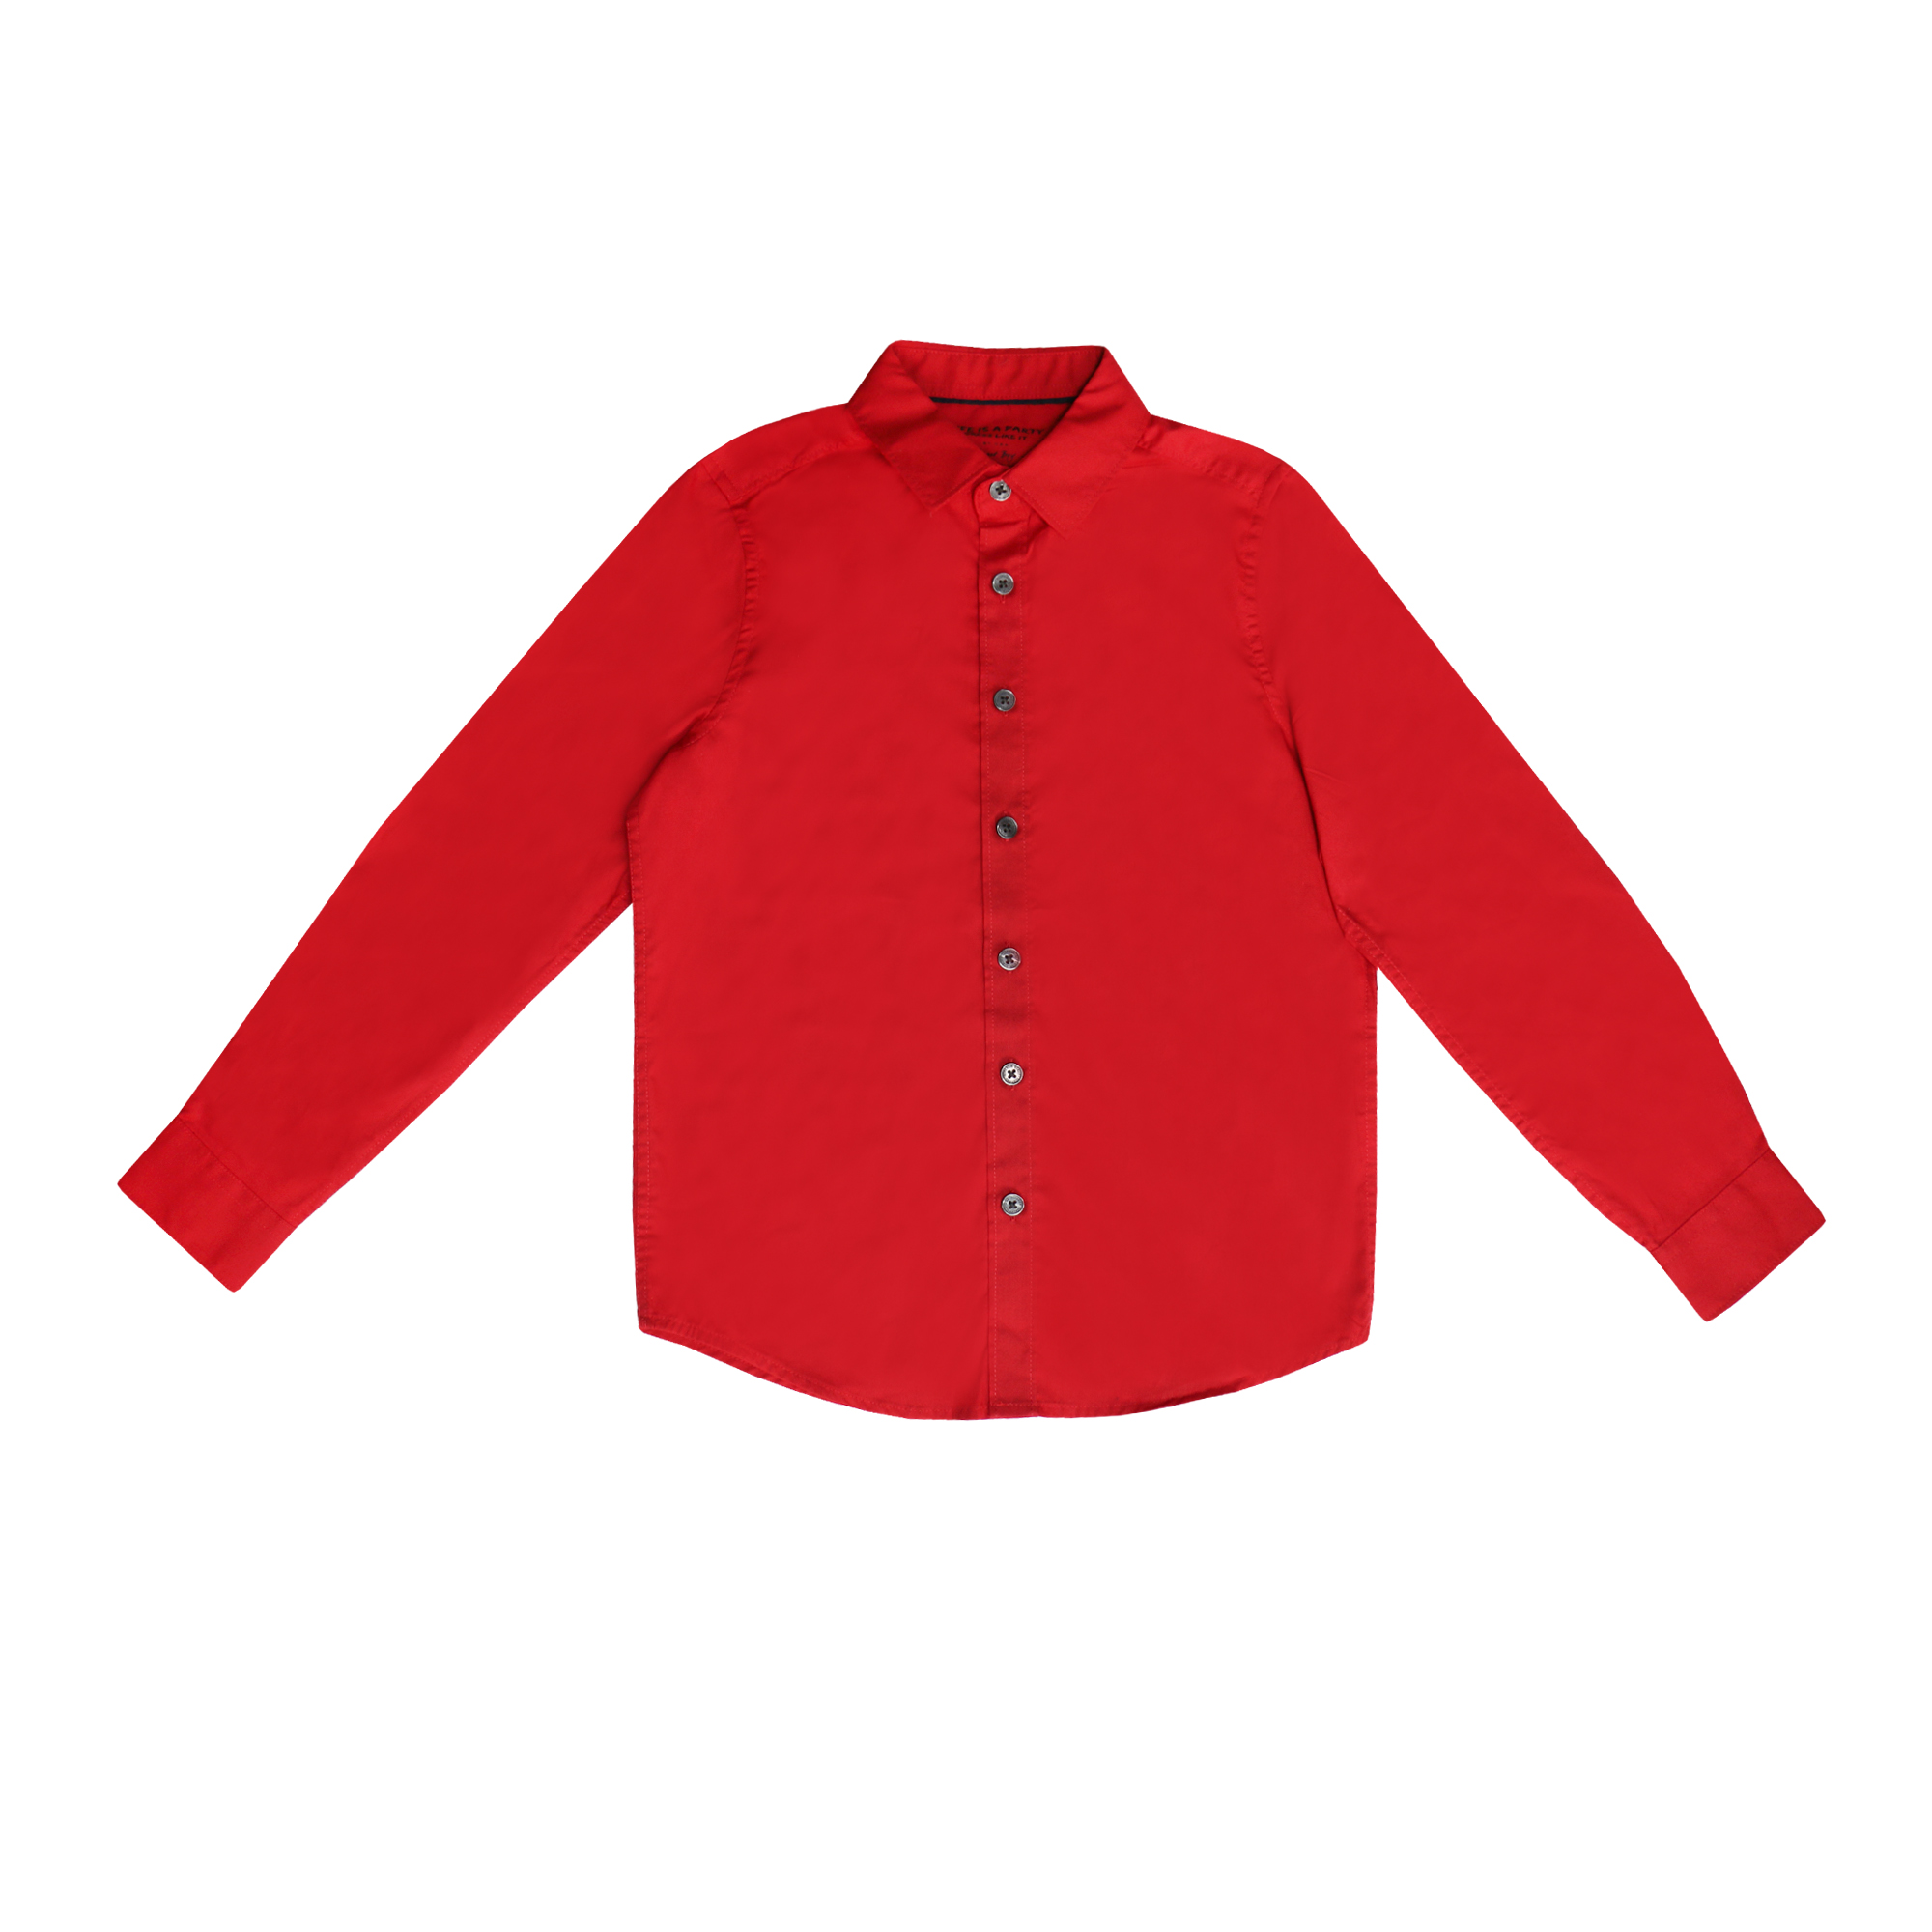 پیراهن پسرانه کد P90